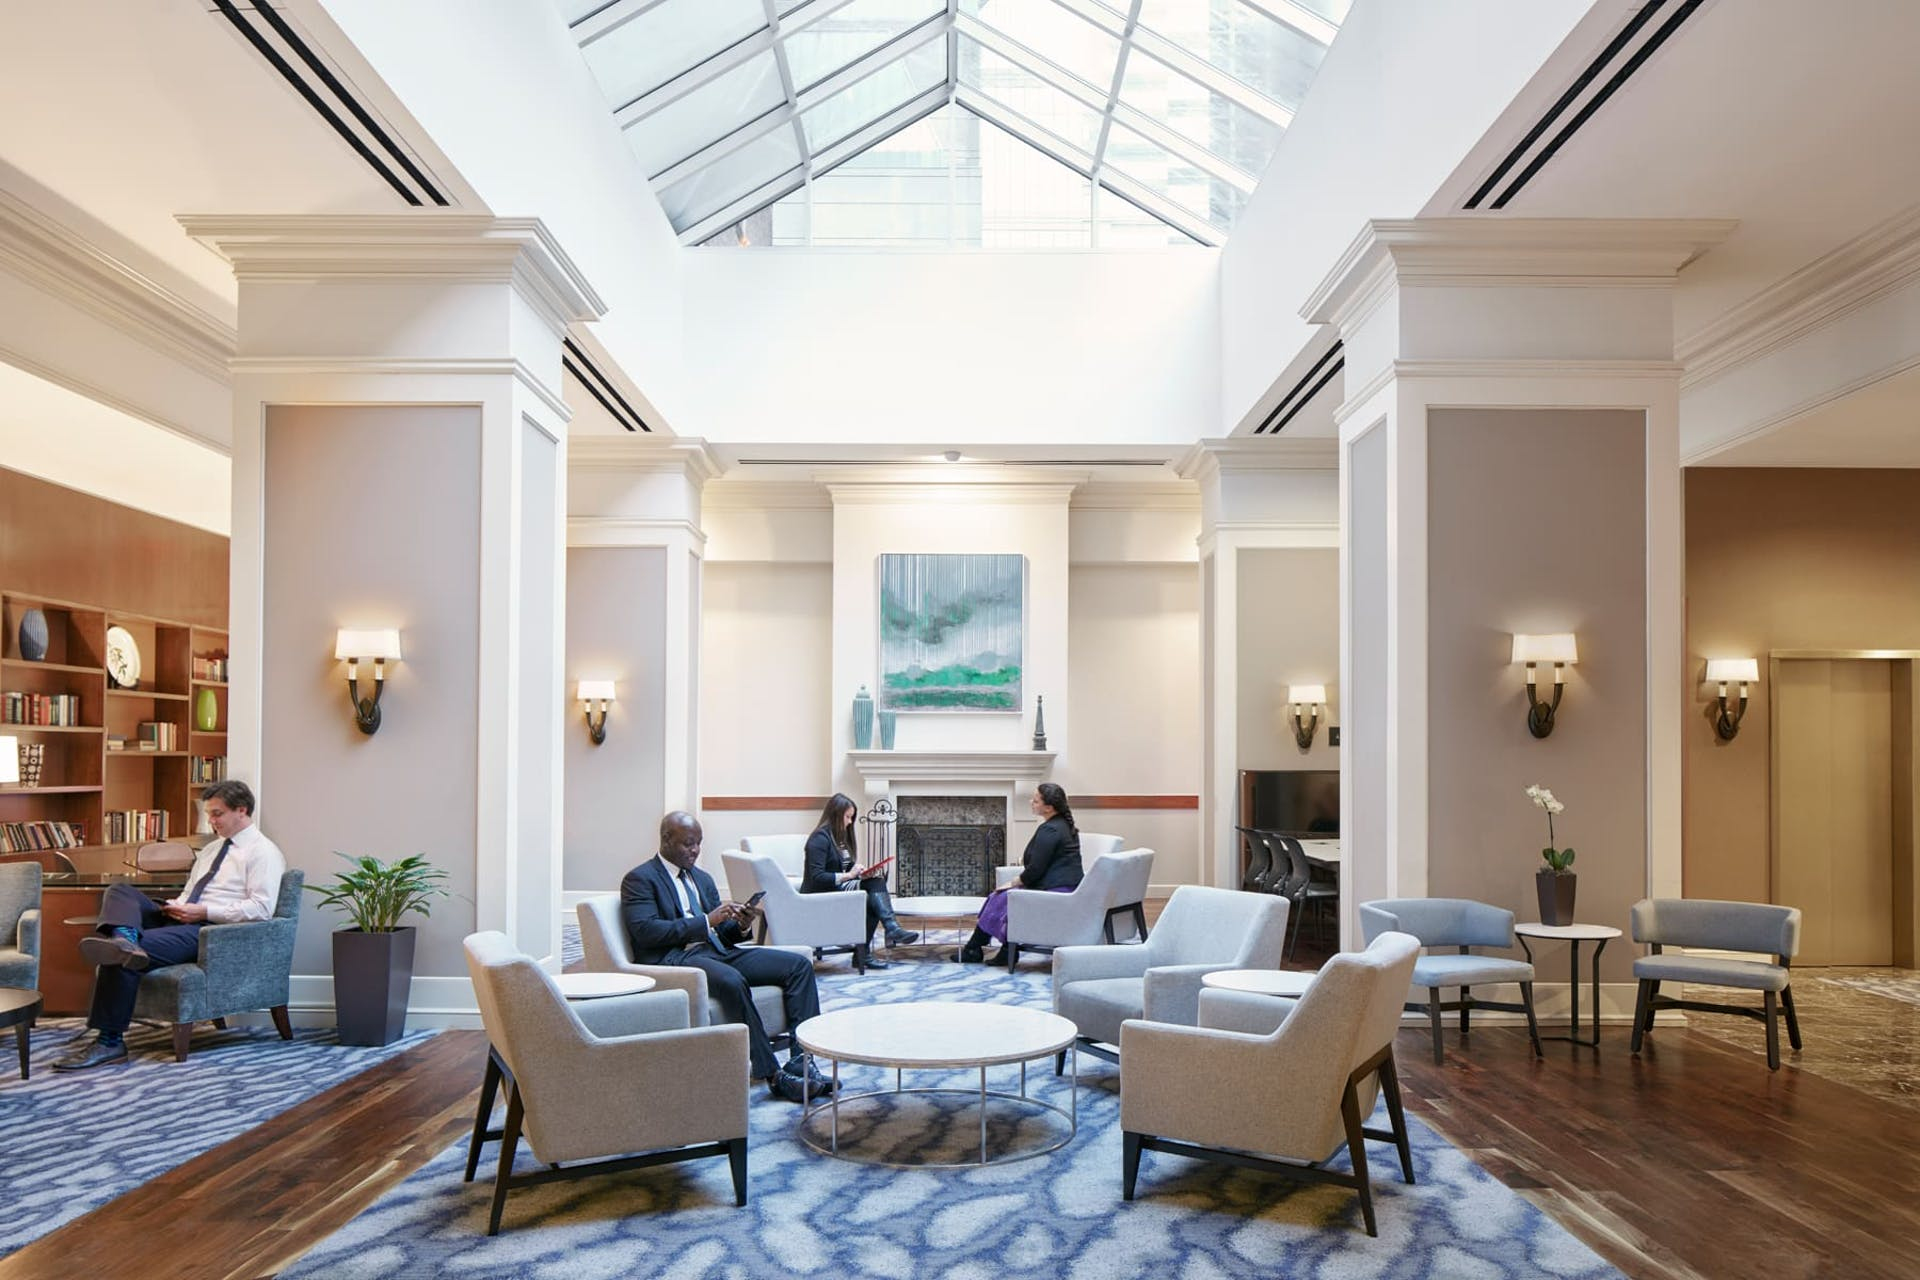 Club Living Room at CQ Hotel, Rittenhouse Square, Philadelphia